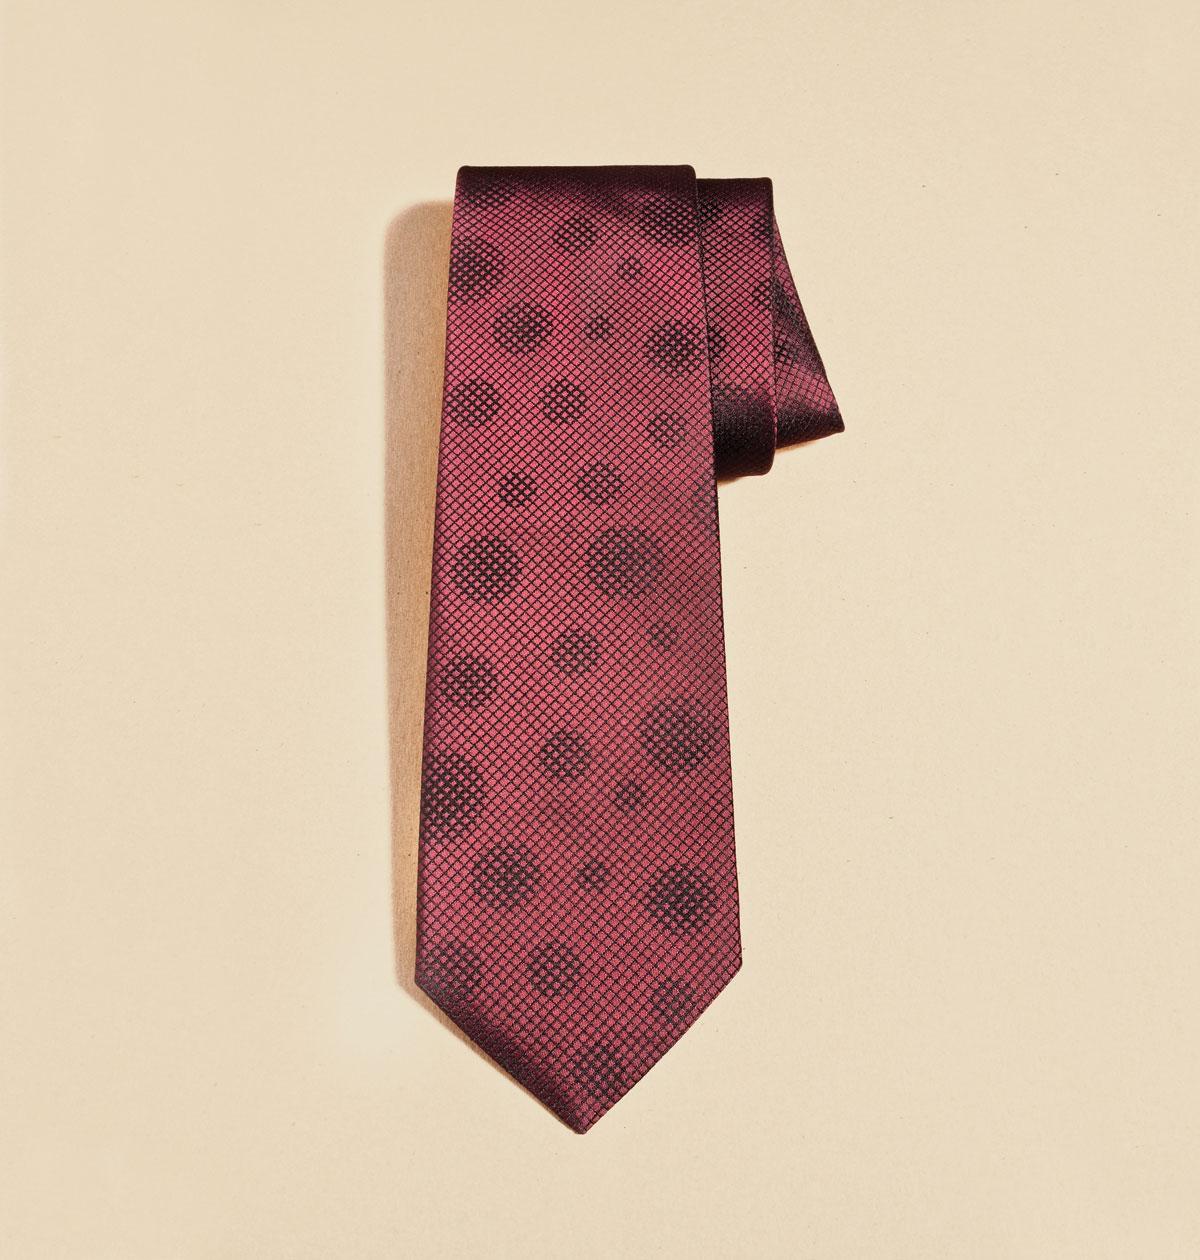 m08-accessoires-cravate-hugo-boss-henri-vezina